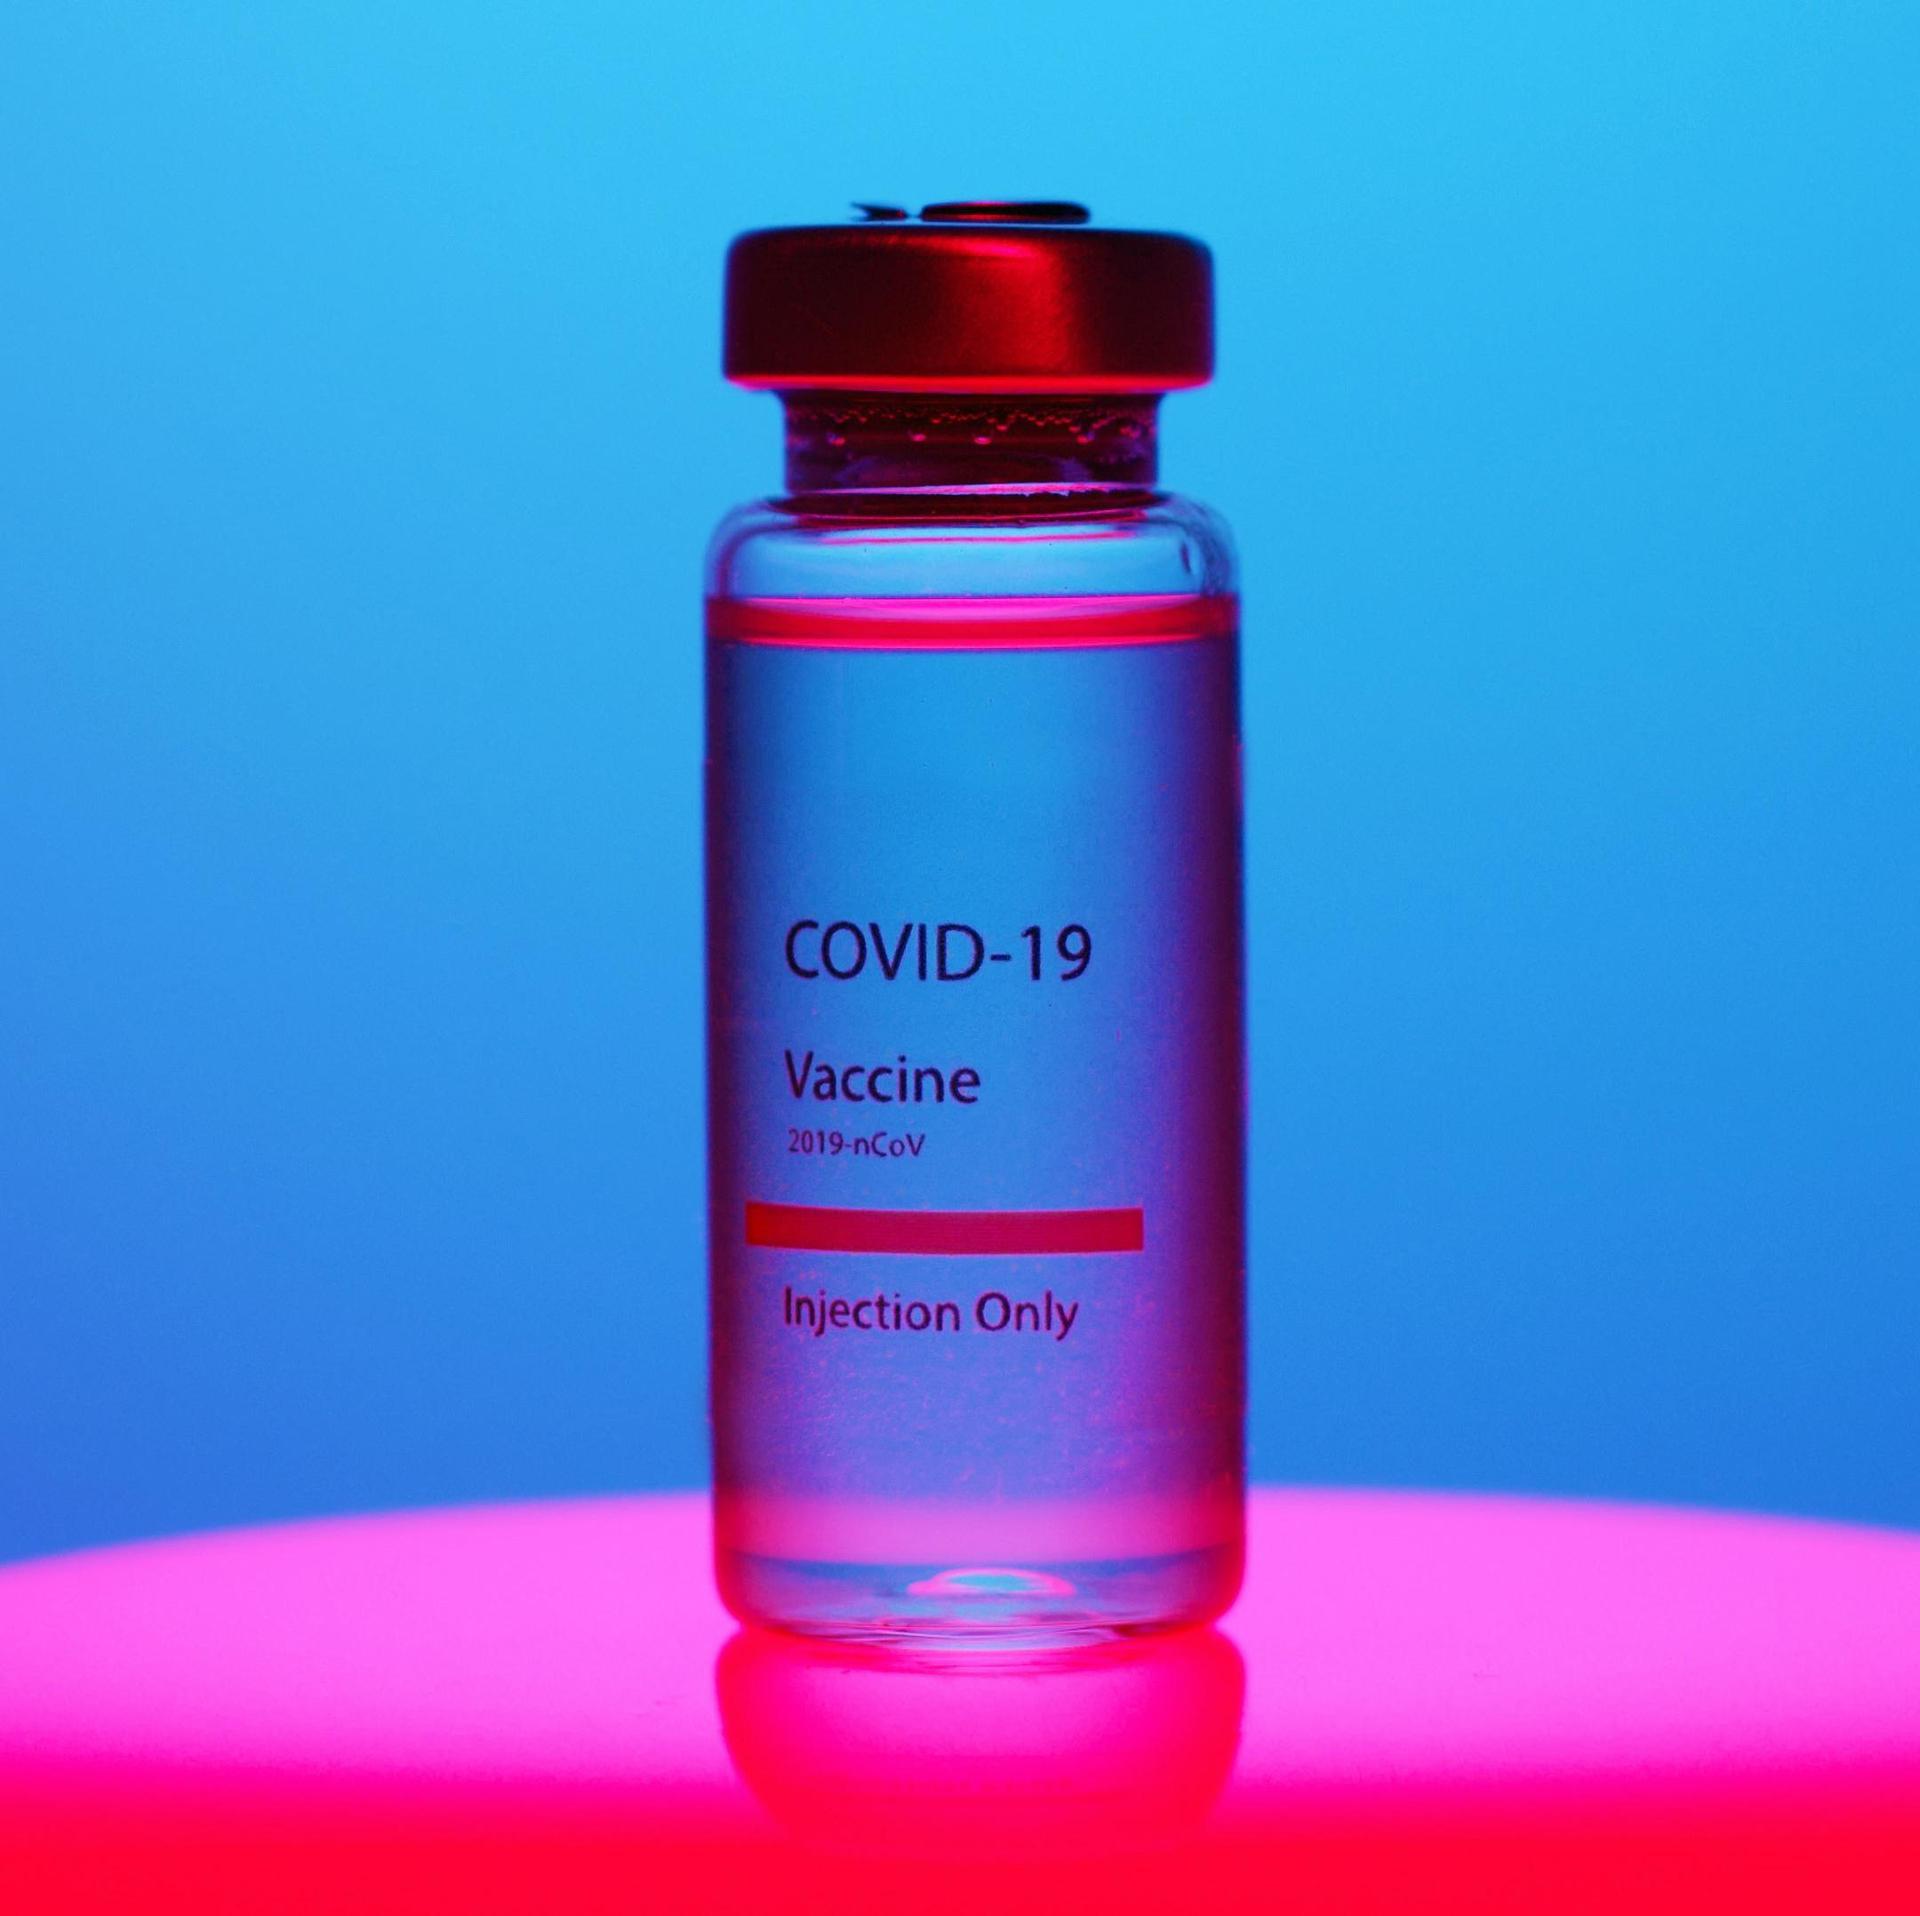 sample vial of vaccine